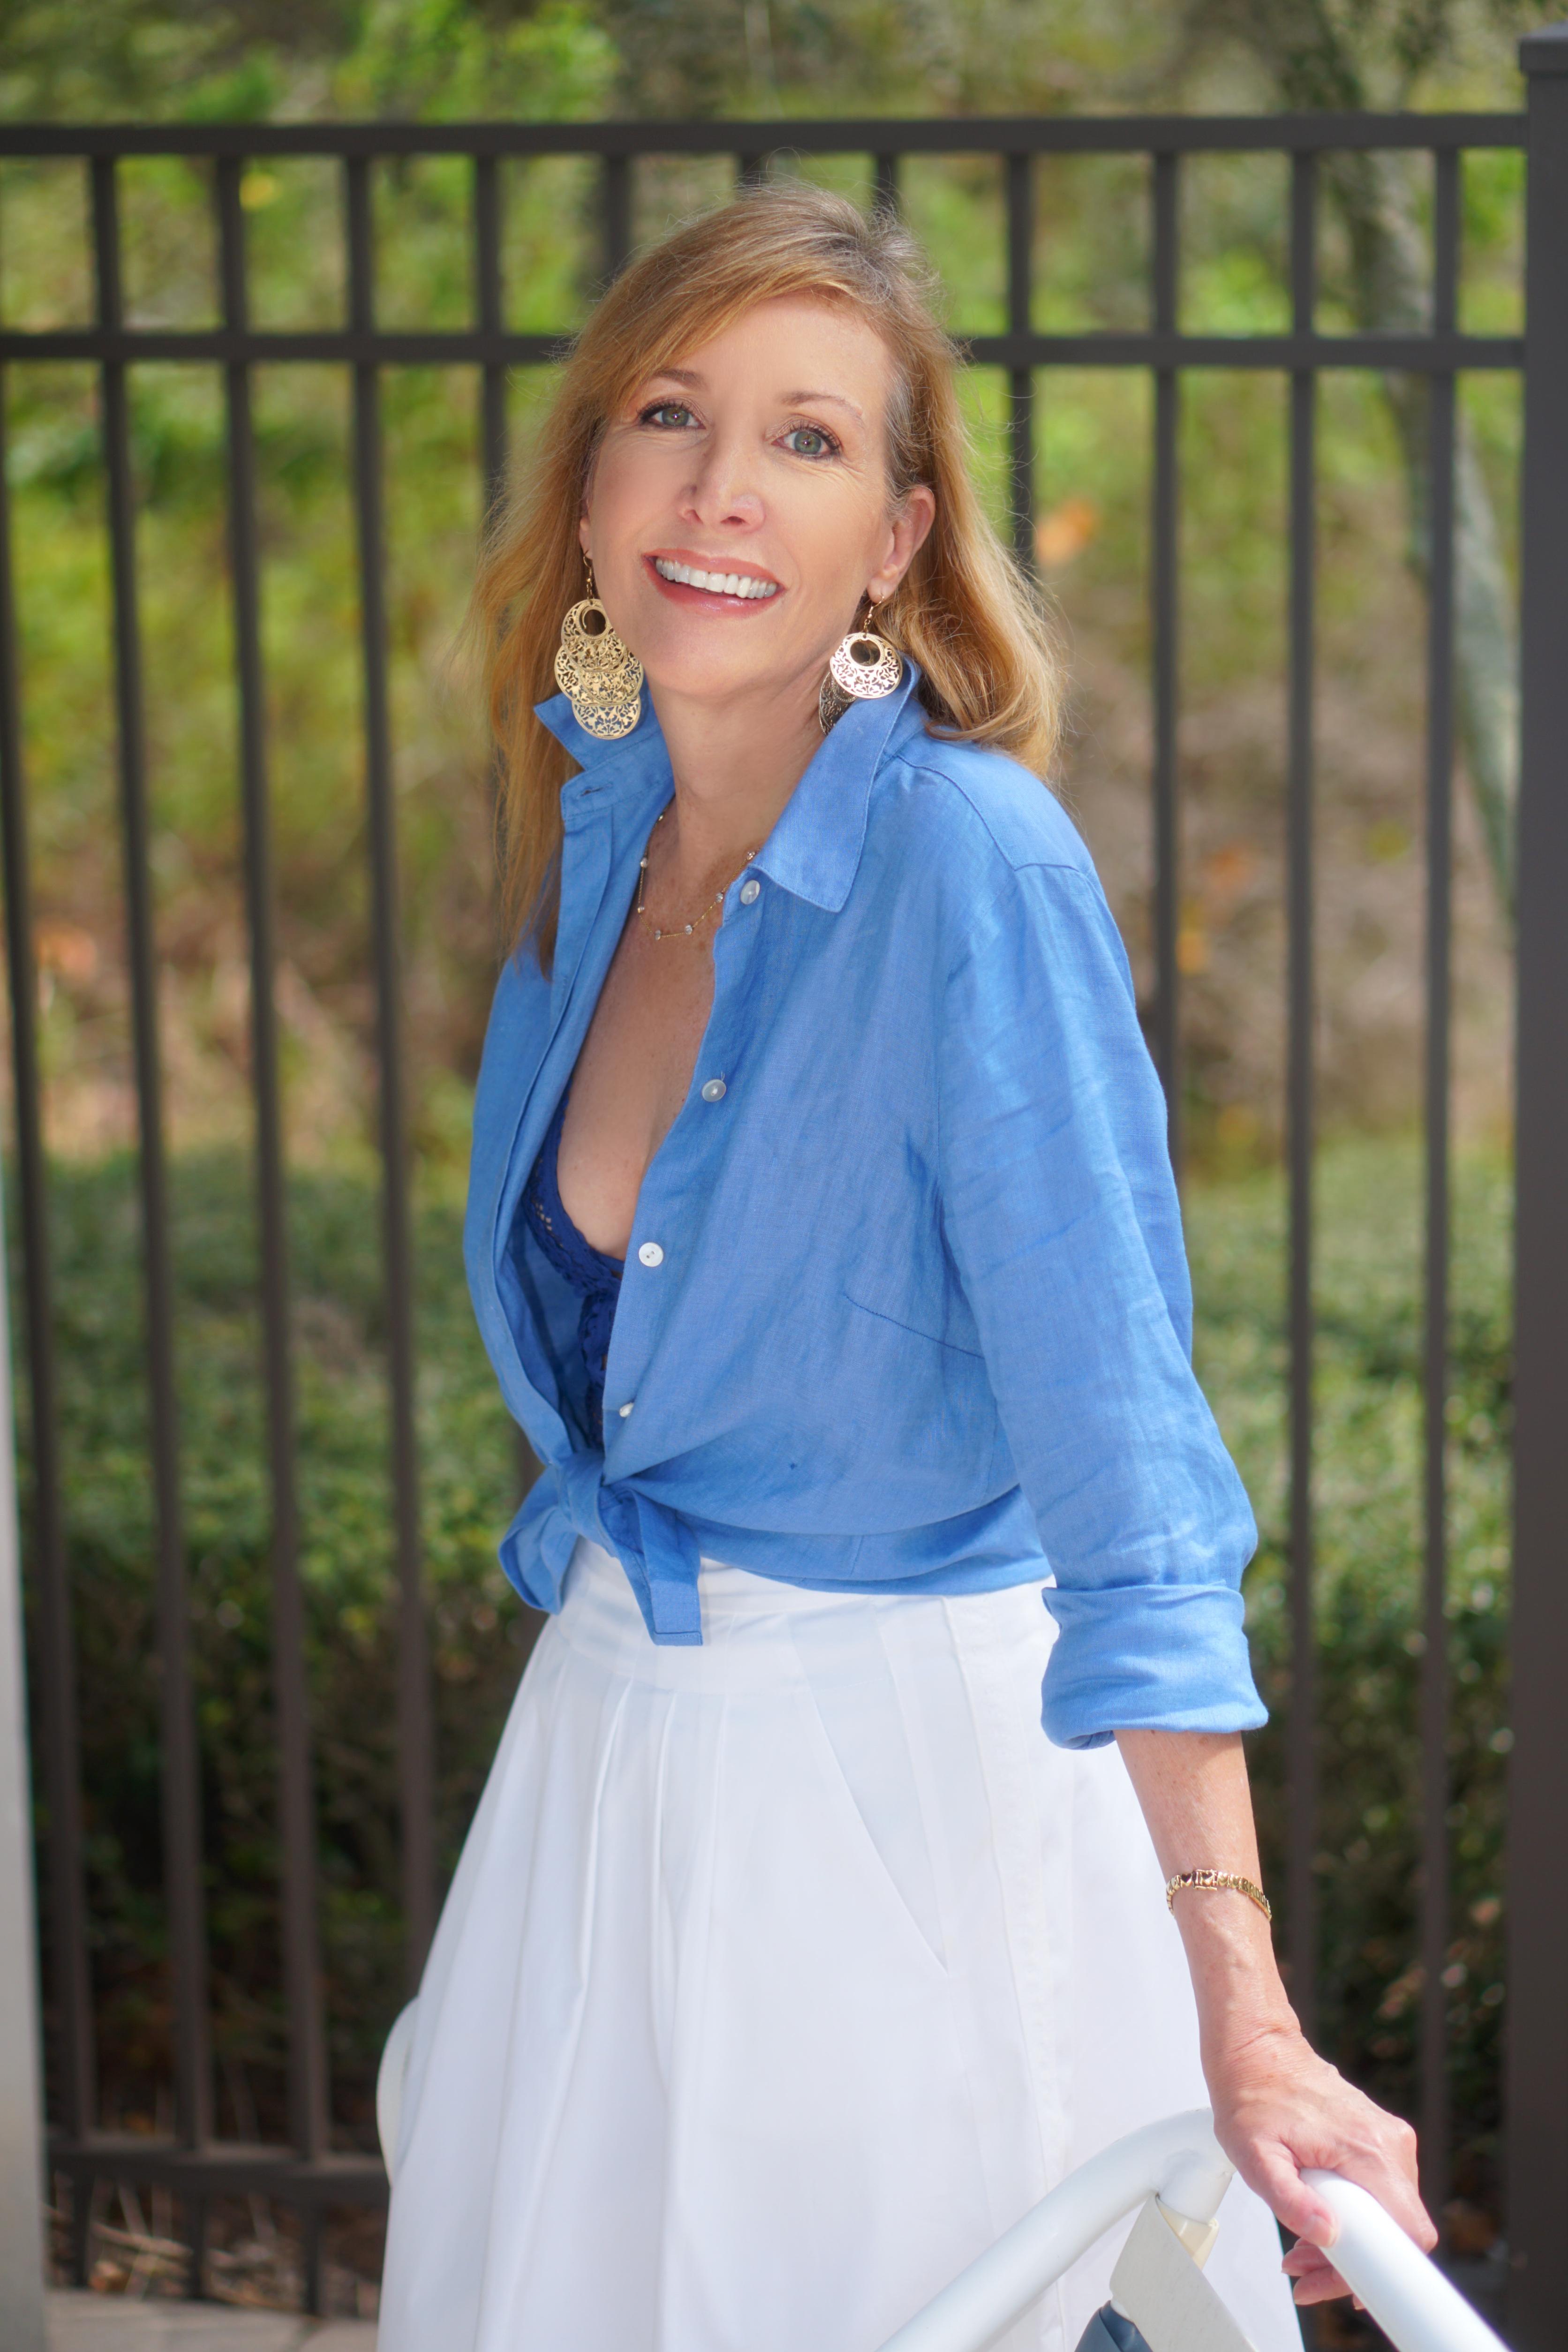 Nina Bandoni sharing a journey wearing a blue blouce and white skirt